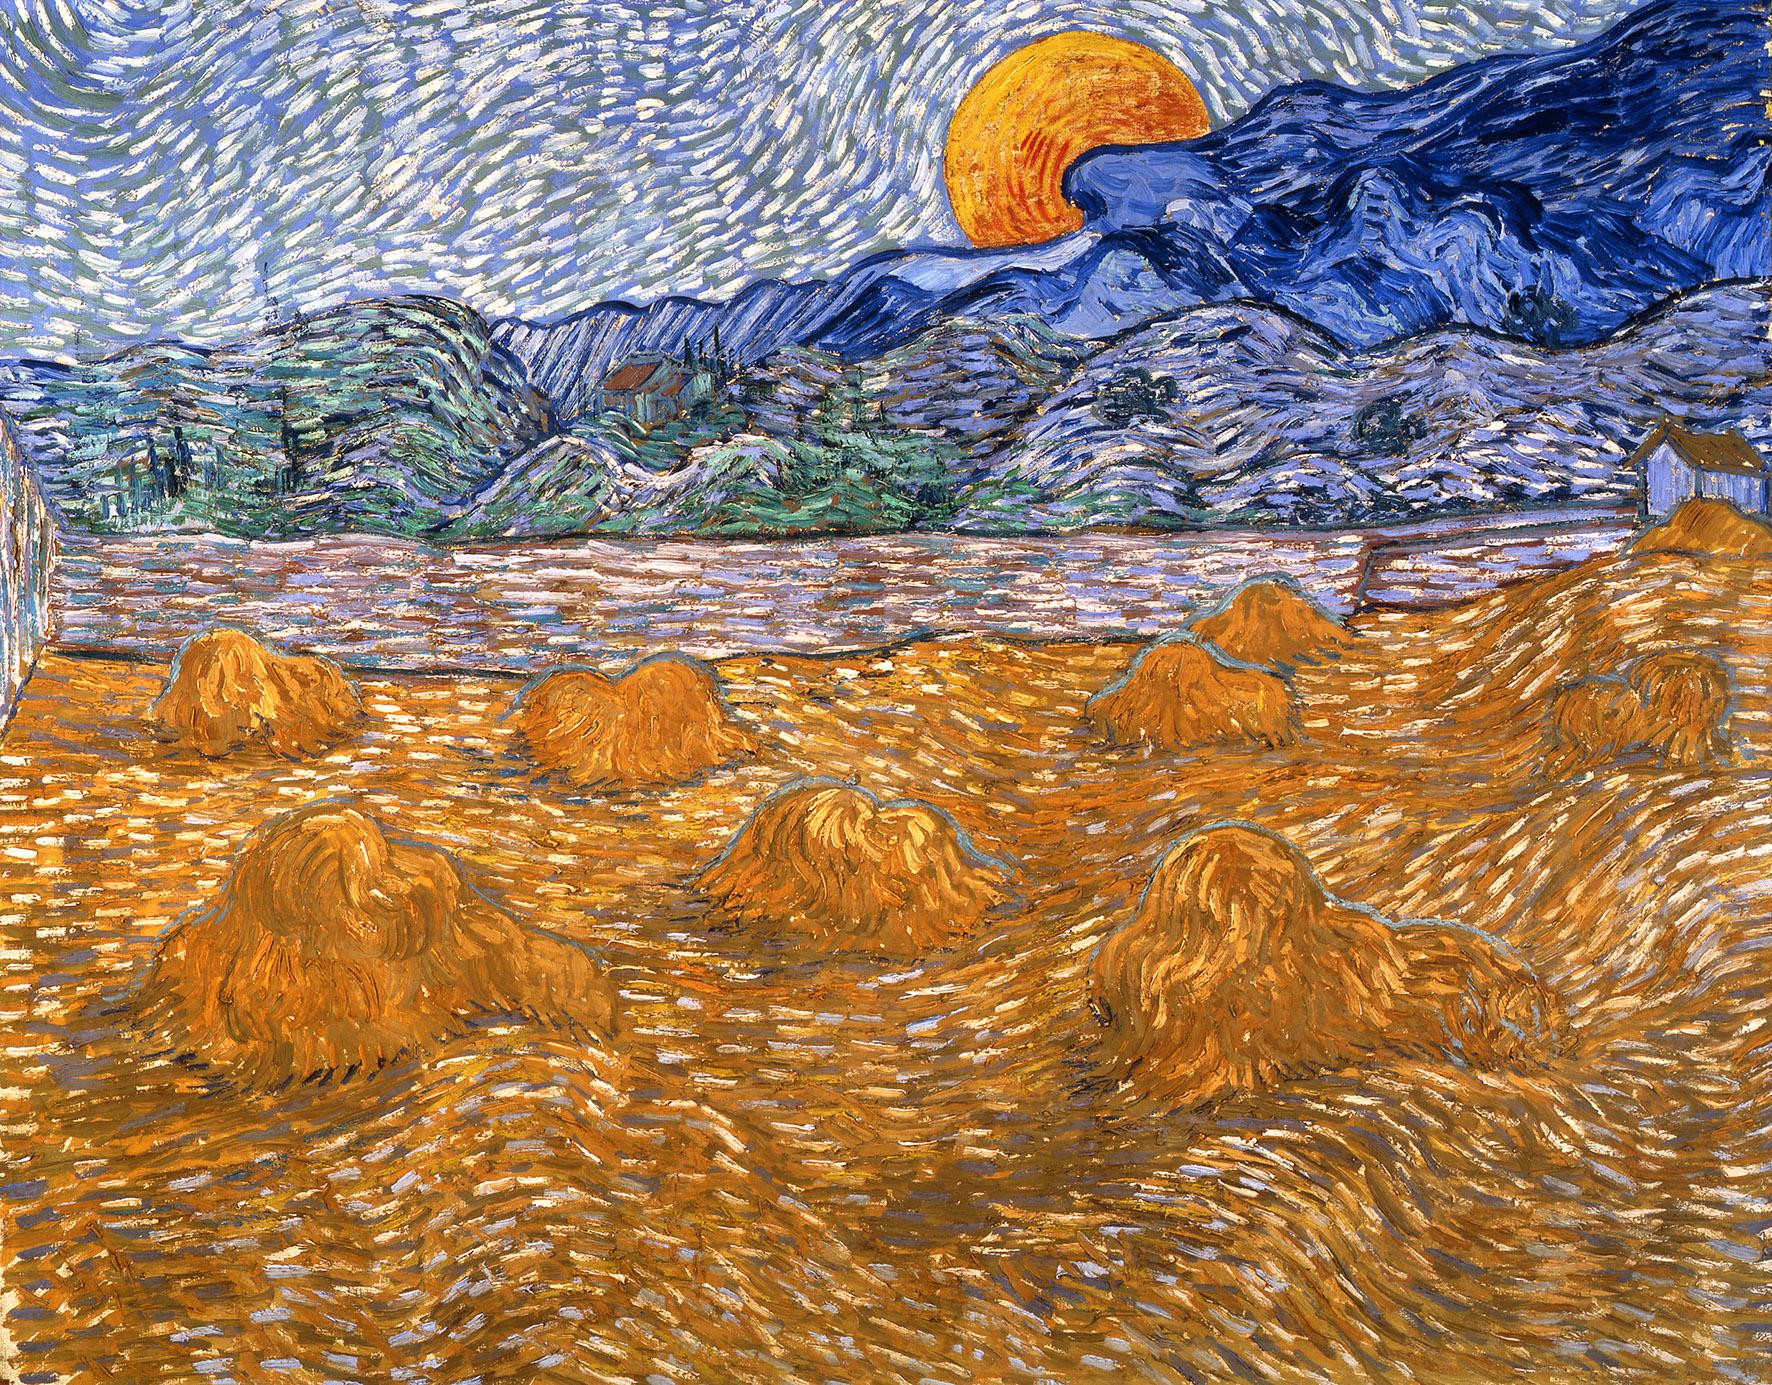 Vincent van Gogh, Paesaggio con covoni e luna nascente, 1889. Otterlo, Kröller-Müller Museum